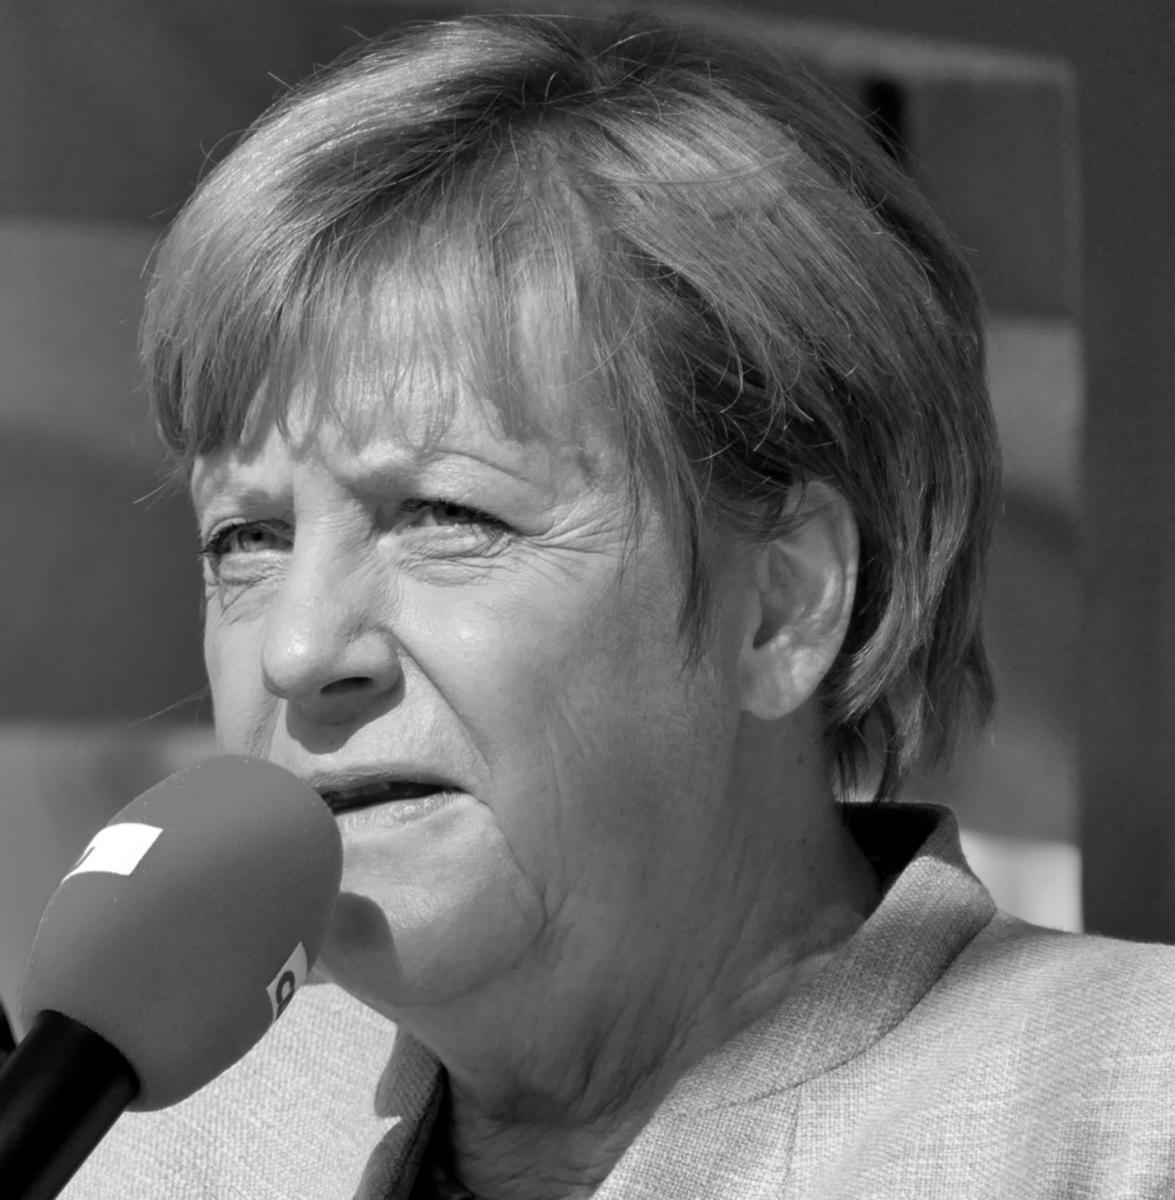 Merkel-Kritiker